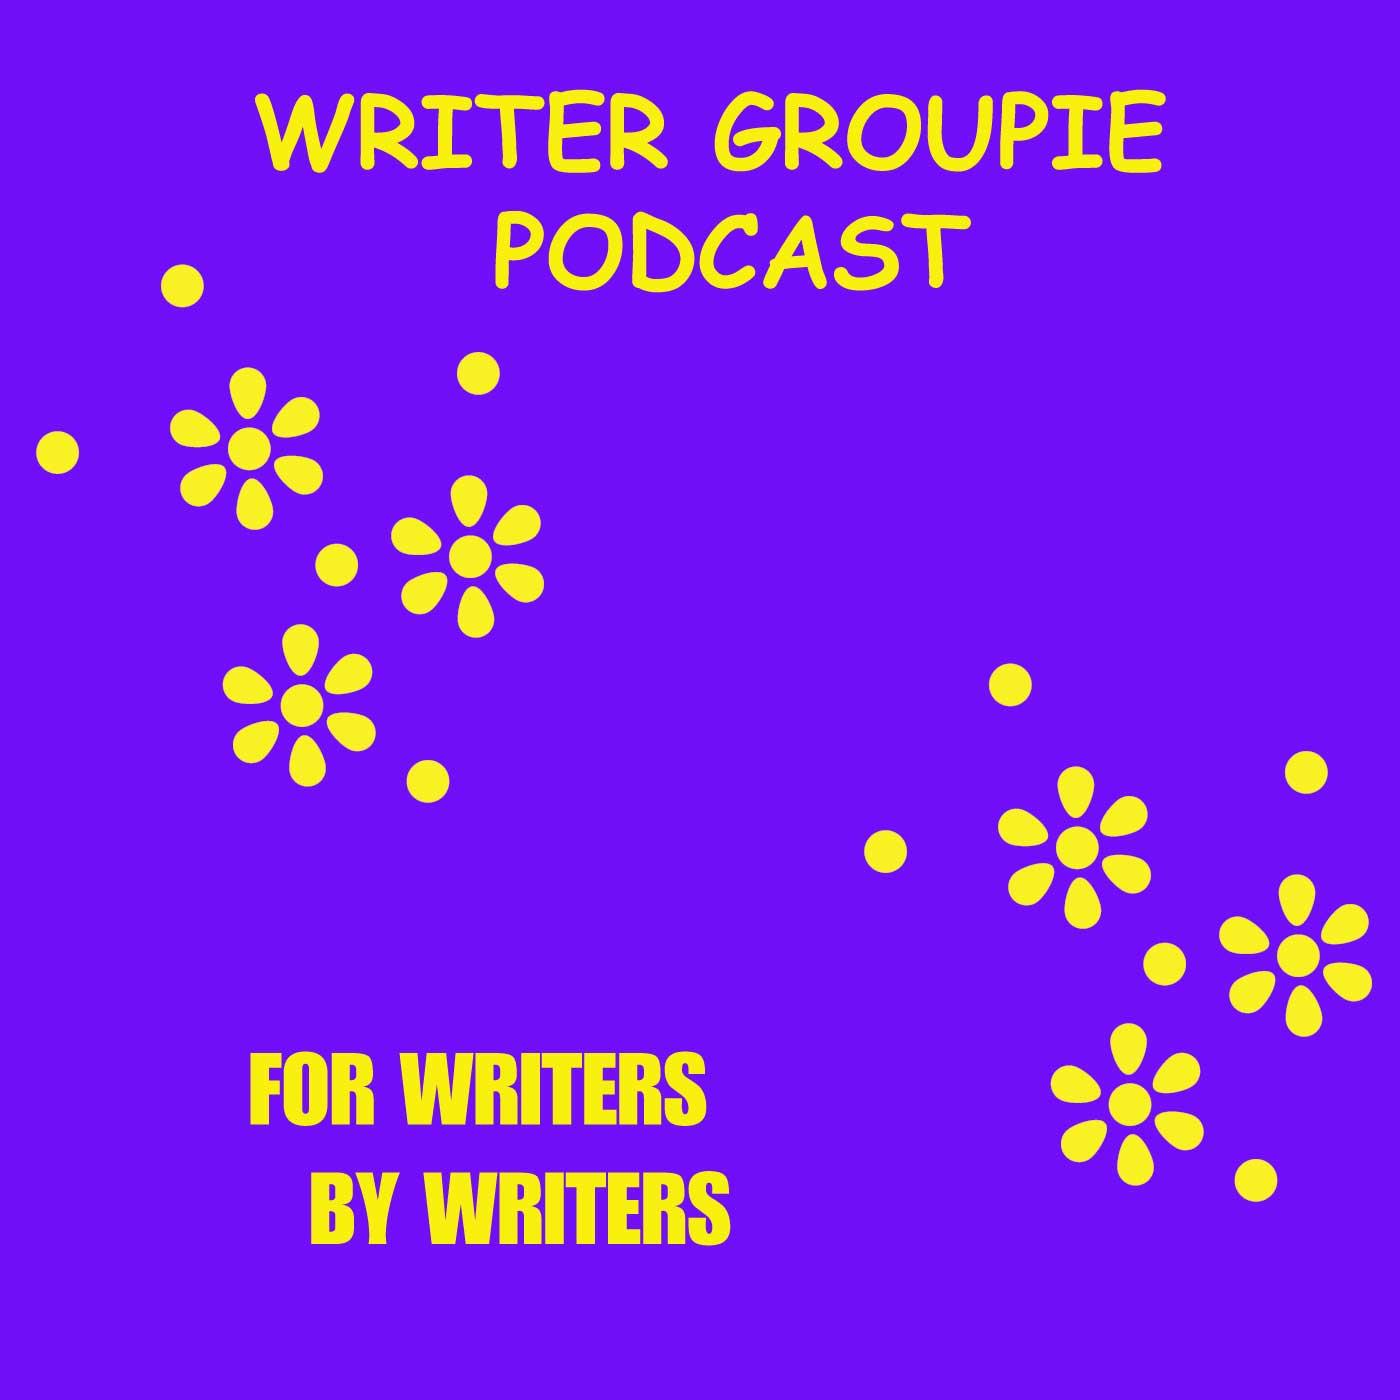 Writer Groupie Podcast